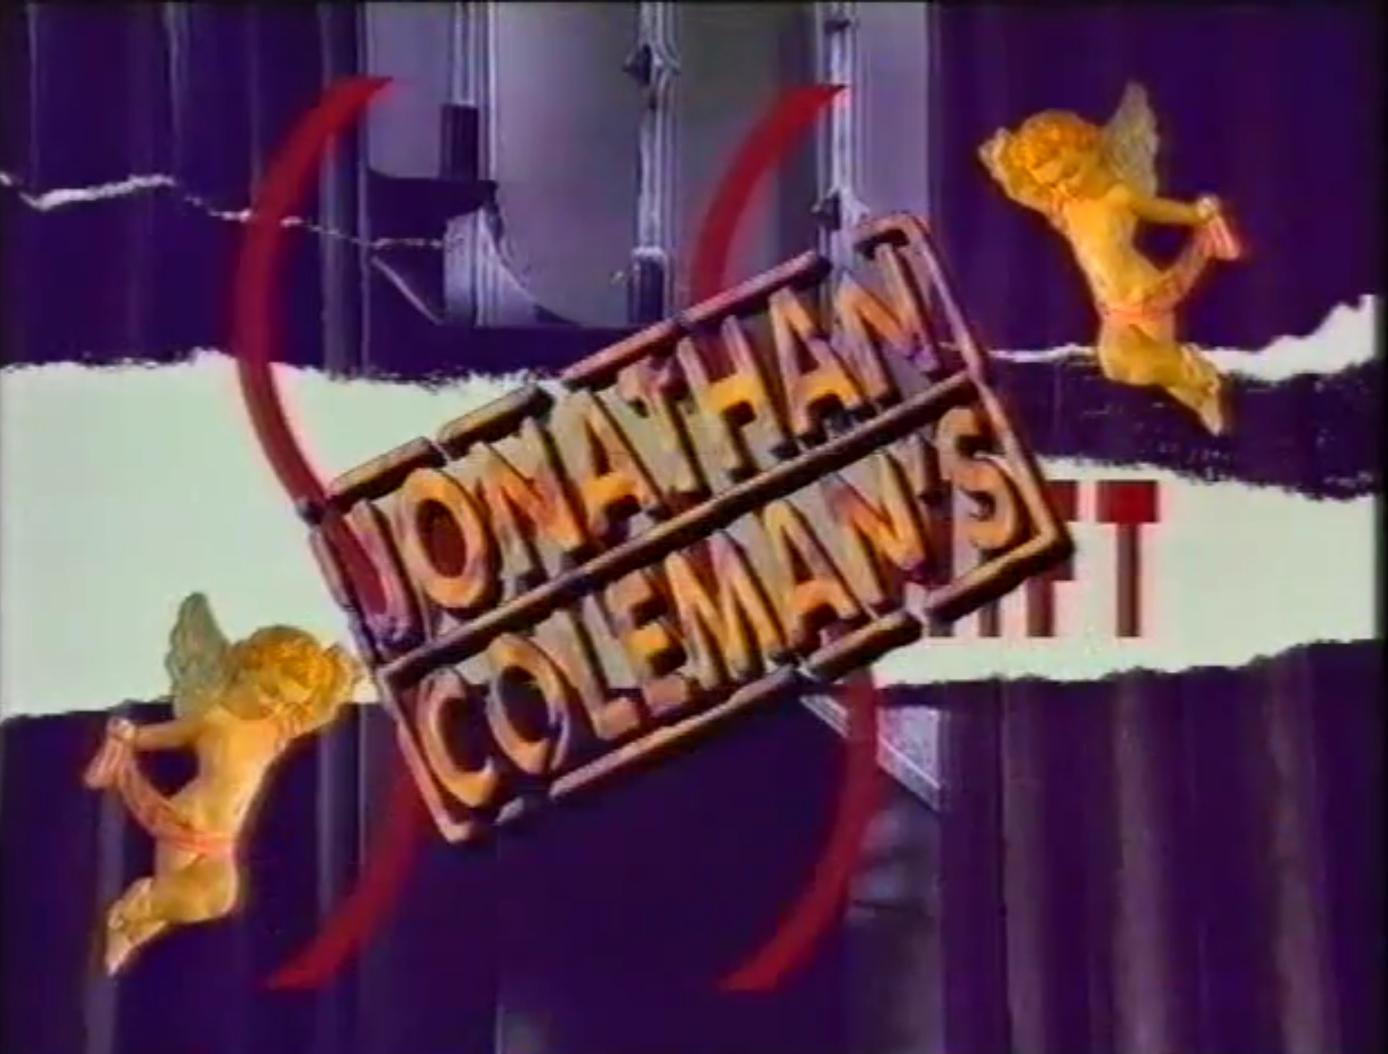 Jonathan Coleman's Swing Shift